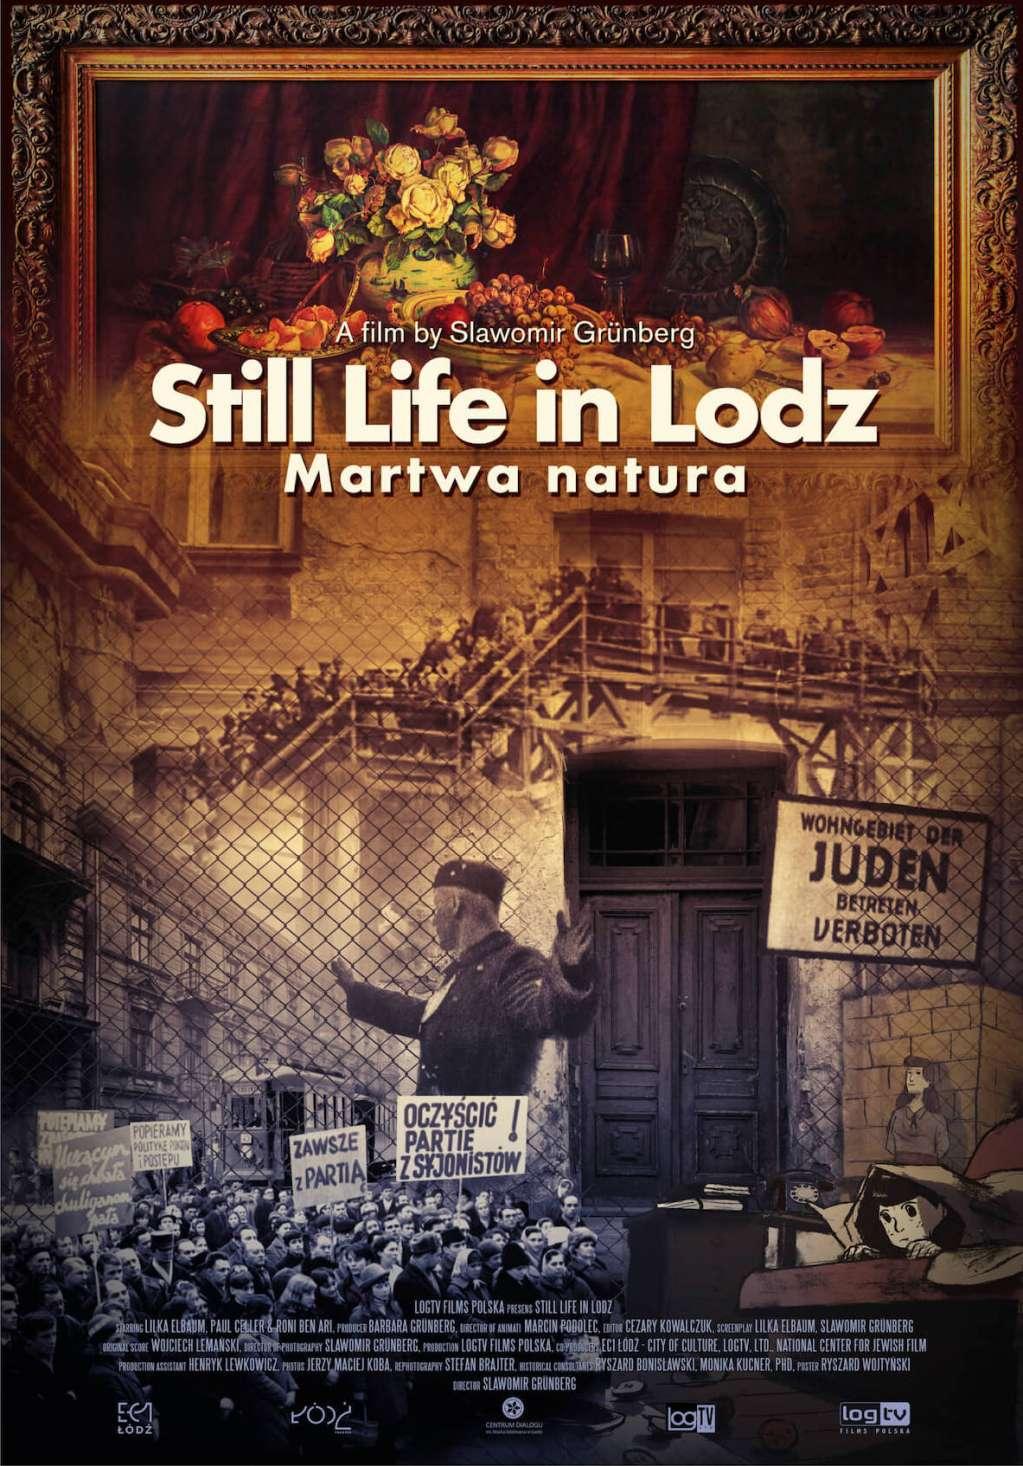 Still Life in Lodz kapak